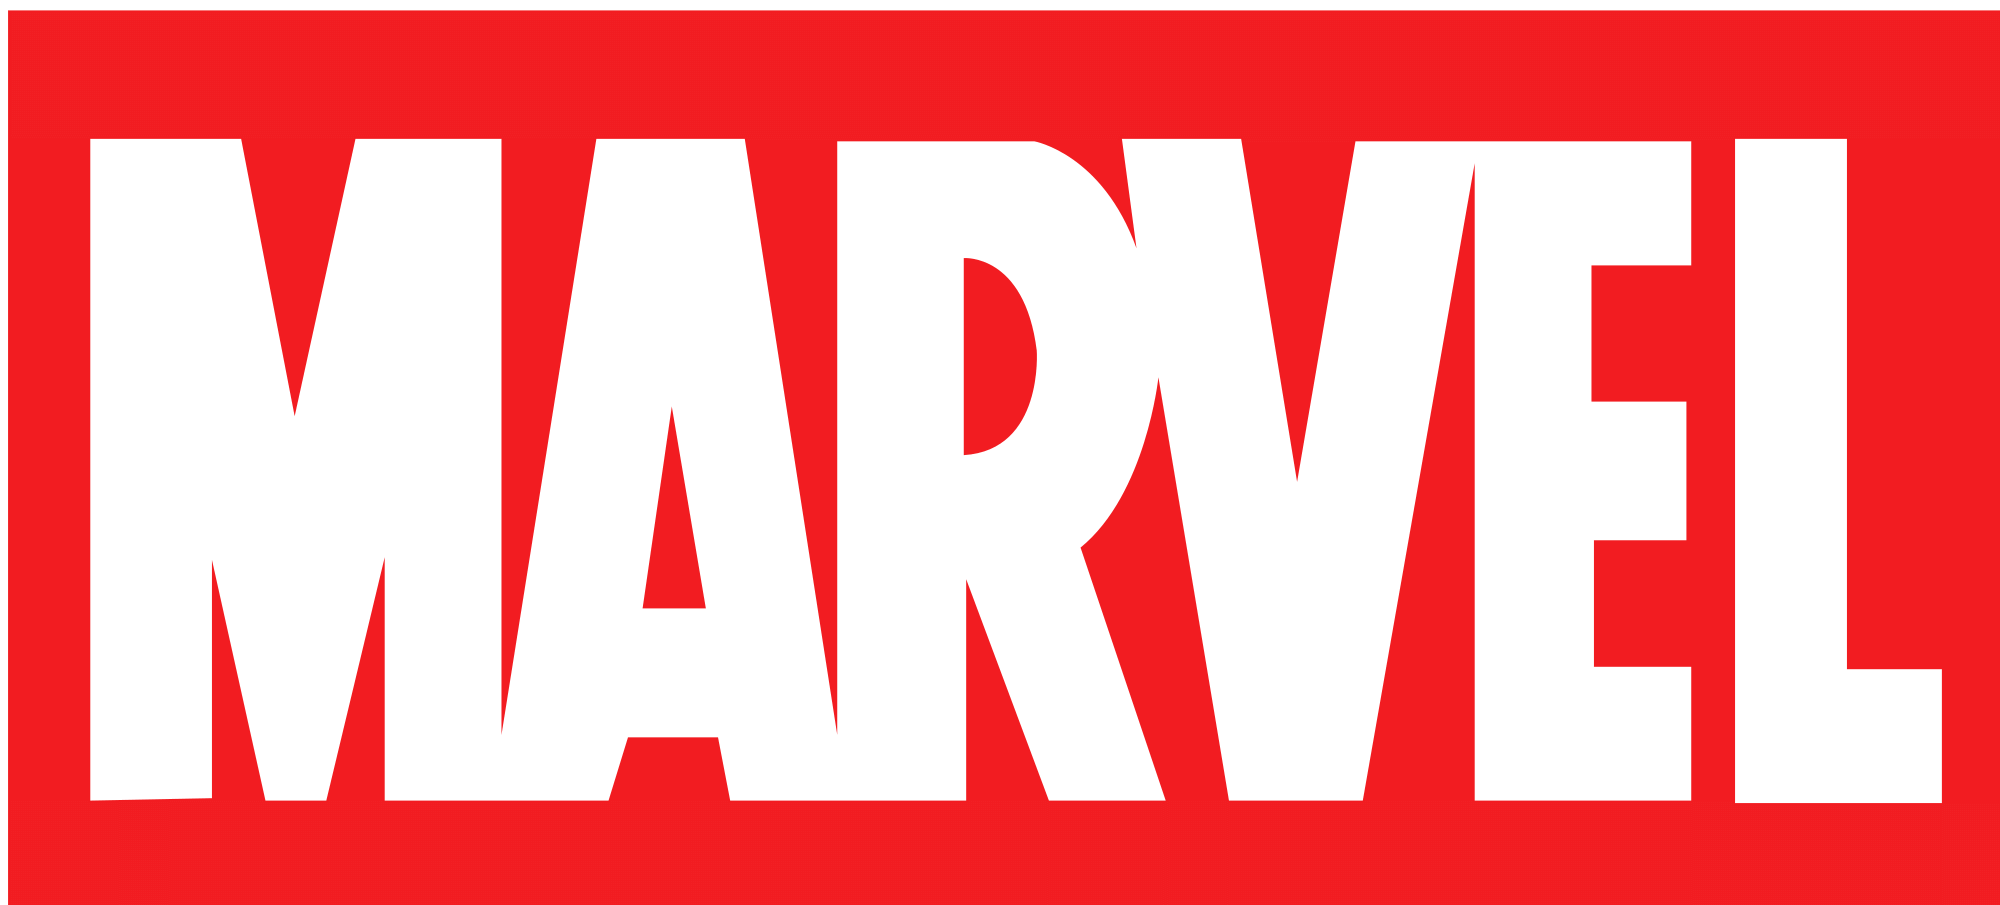 Captain marvel logo clipart.